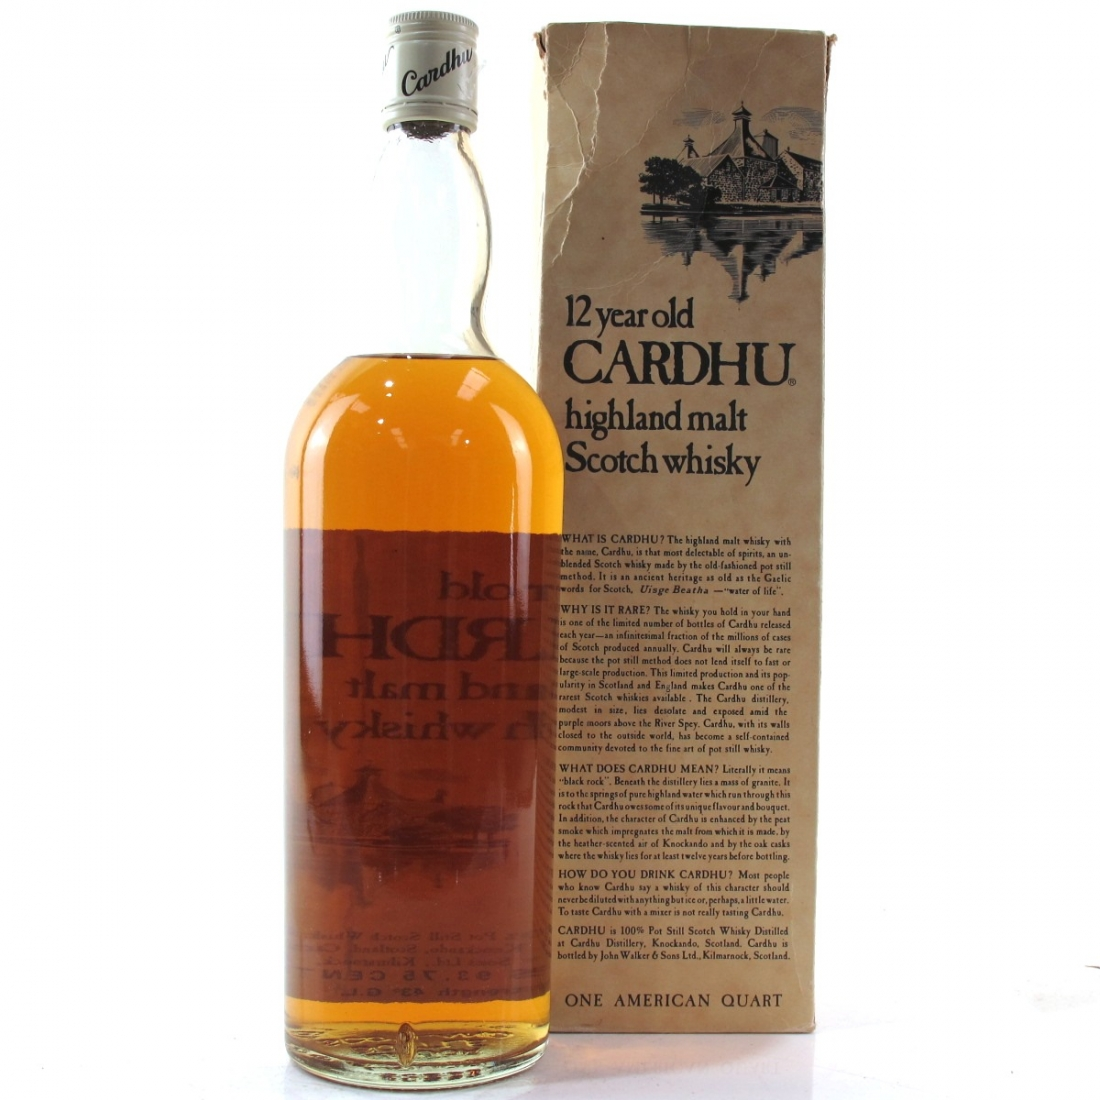 Cardhu 12 Year Old 1 Quart 1970/80s US Import